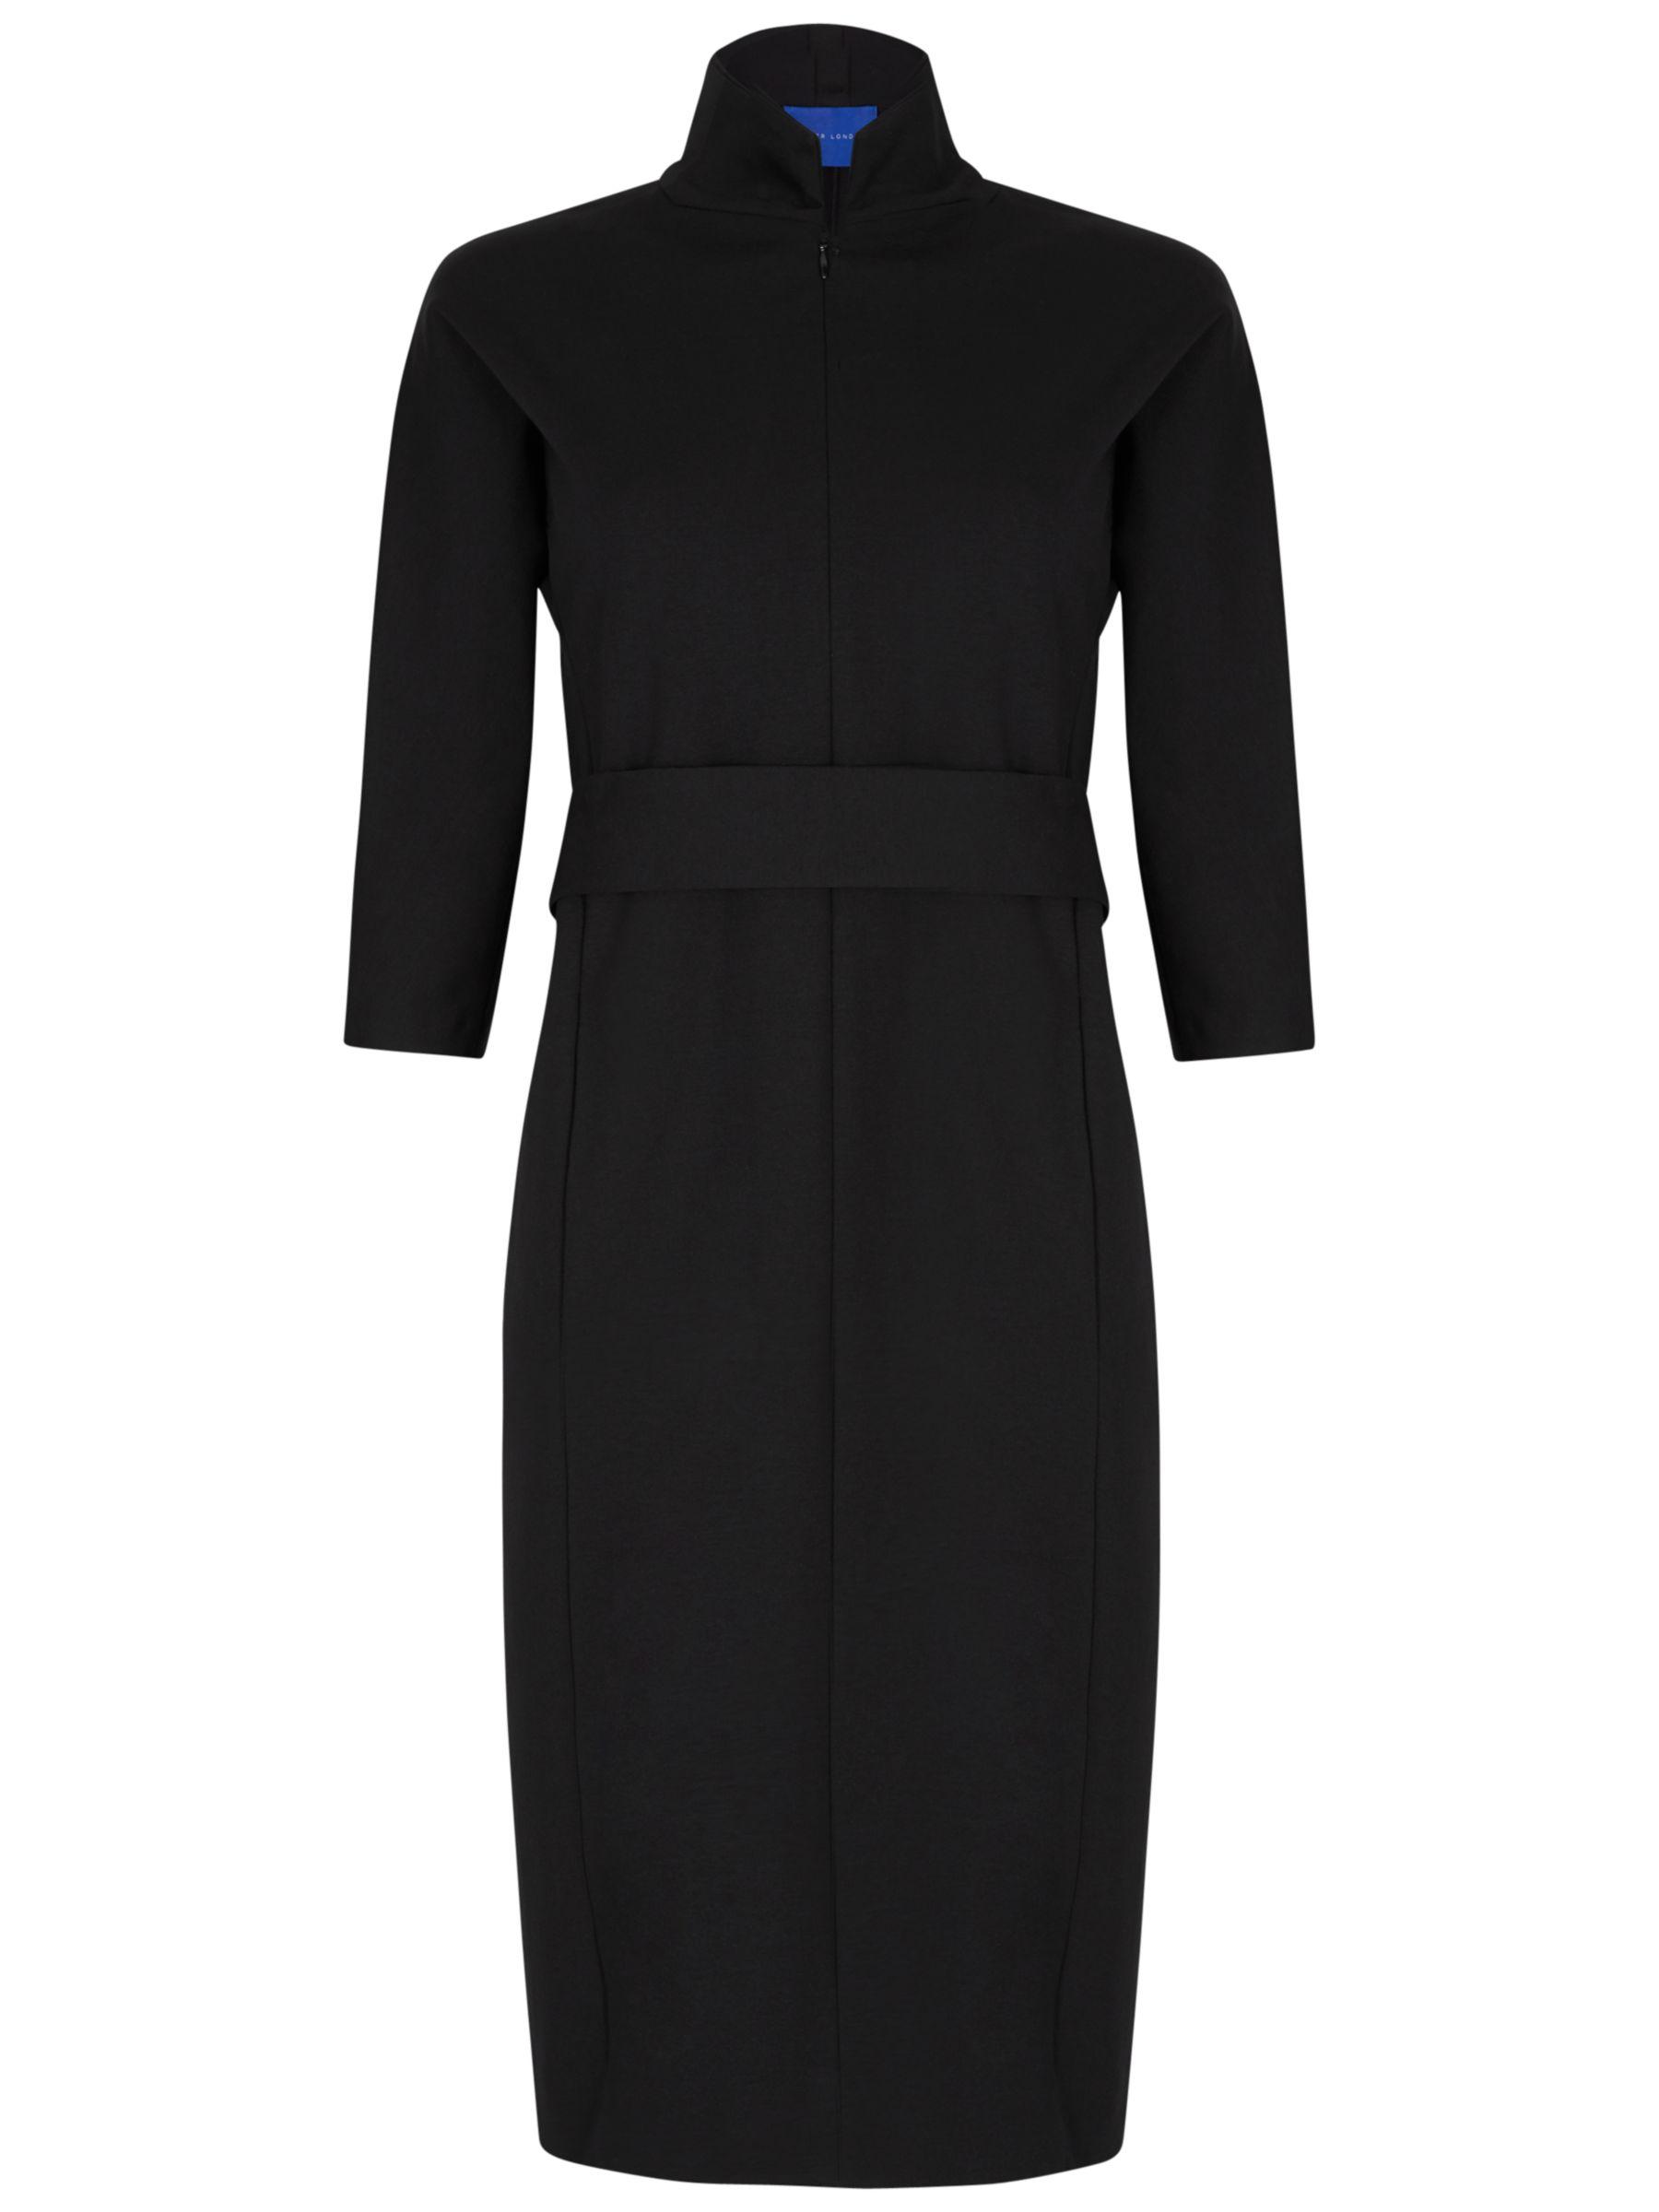 Cheap dress london zip